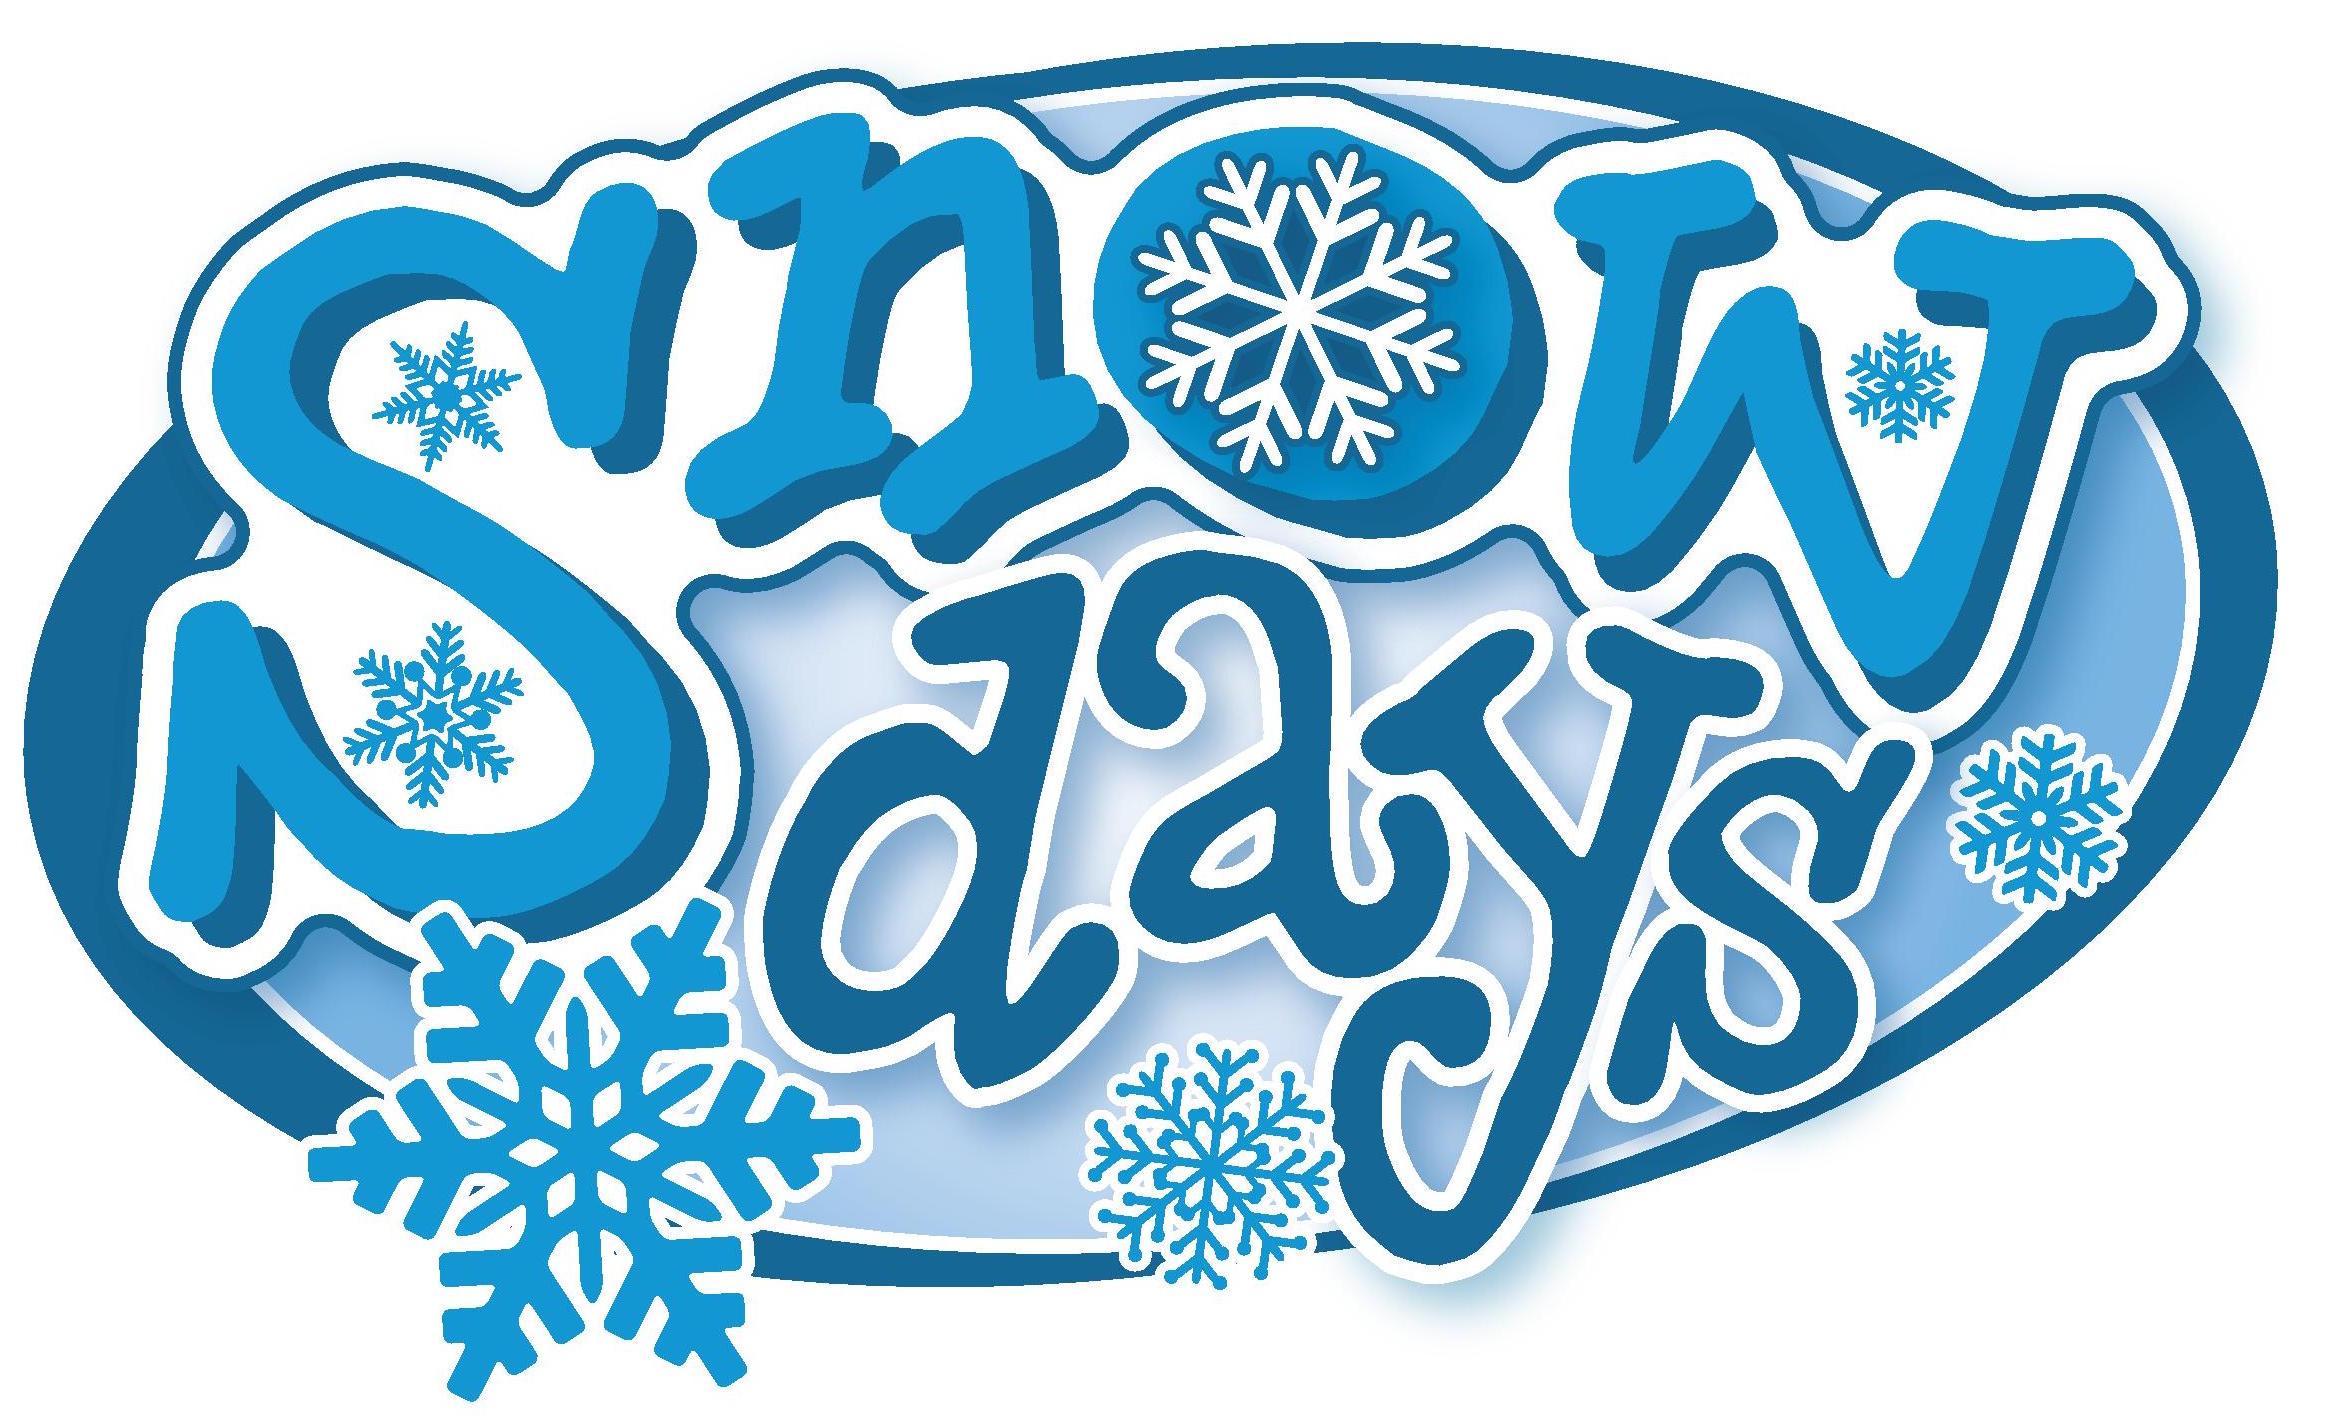 SnowDaysLogo-page-001 (1).jpg